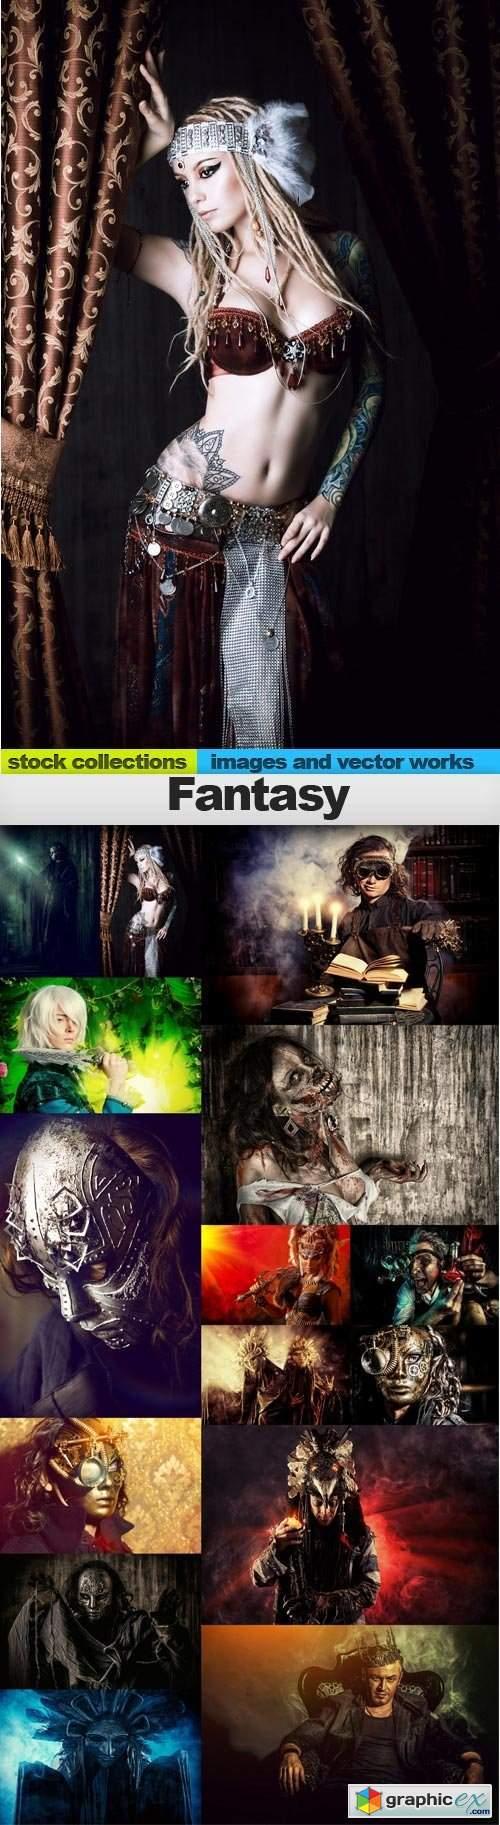 Fantasy, 15 x UHQ JPEG